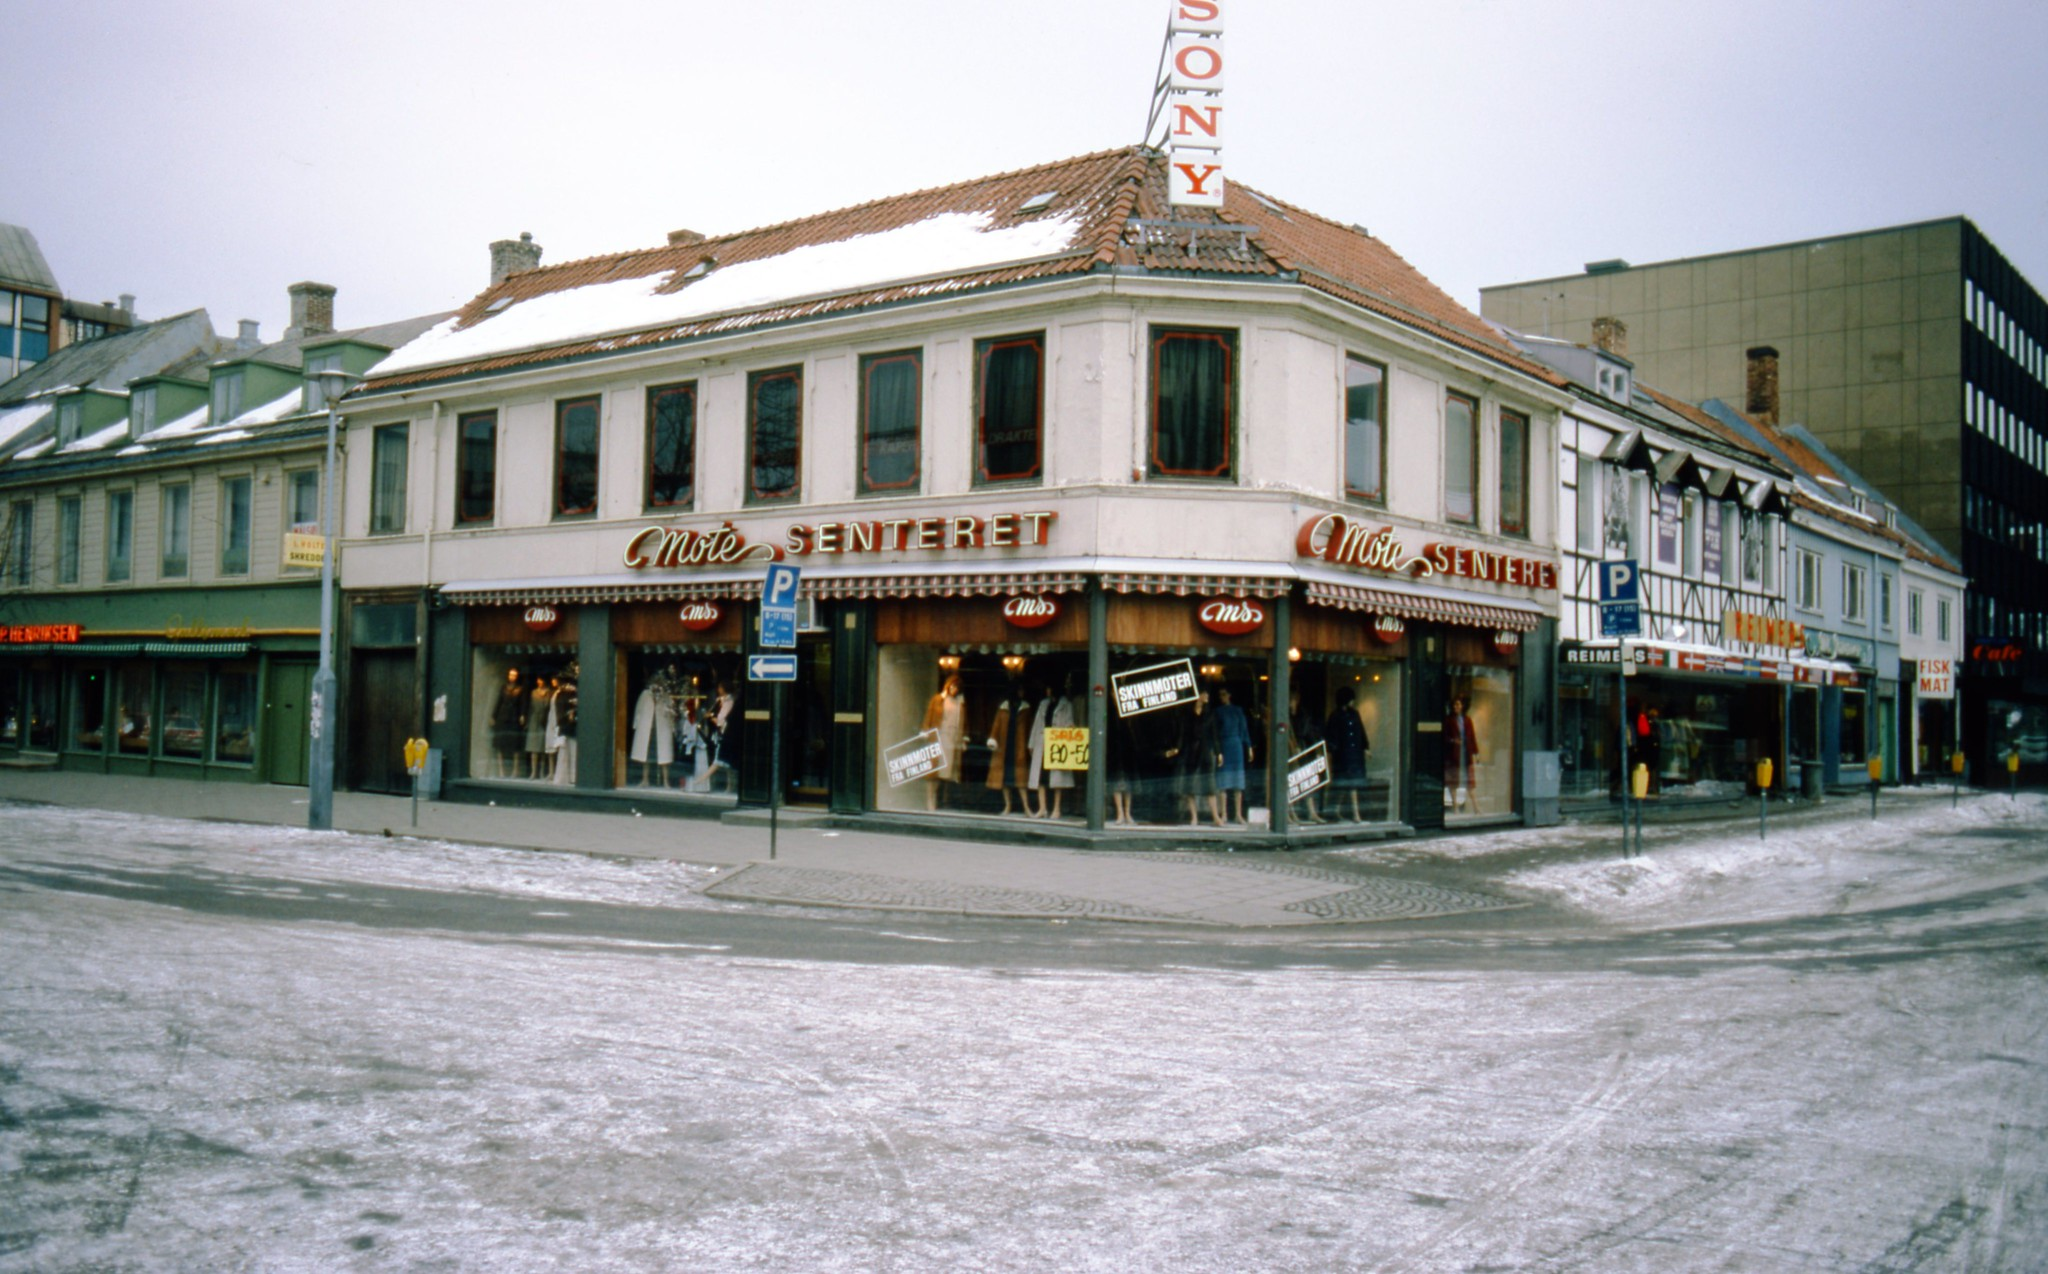 mote norge Trondheim